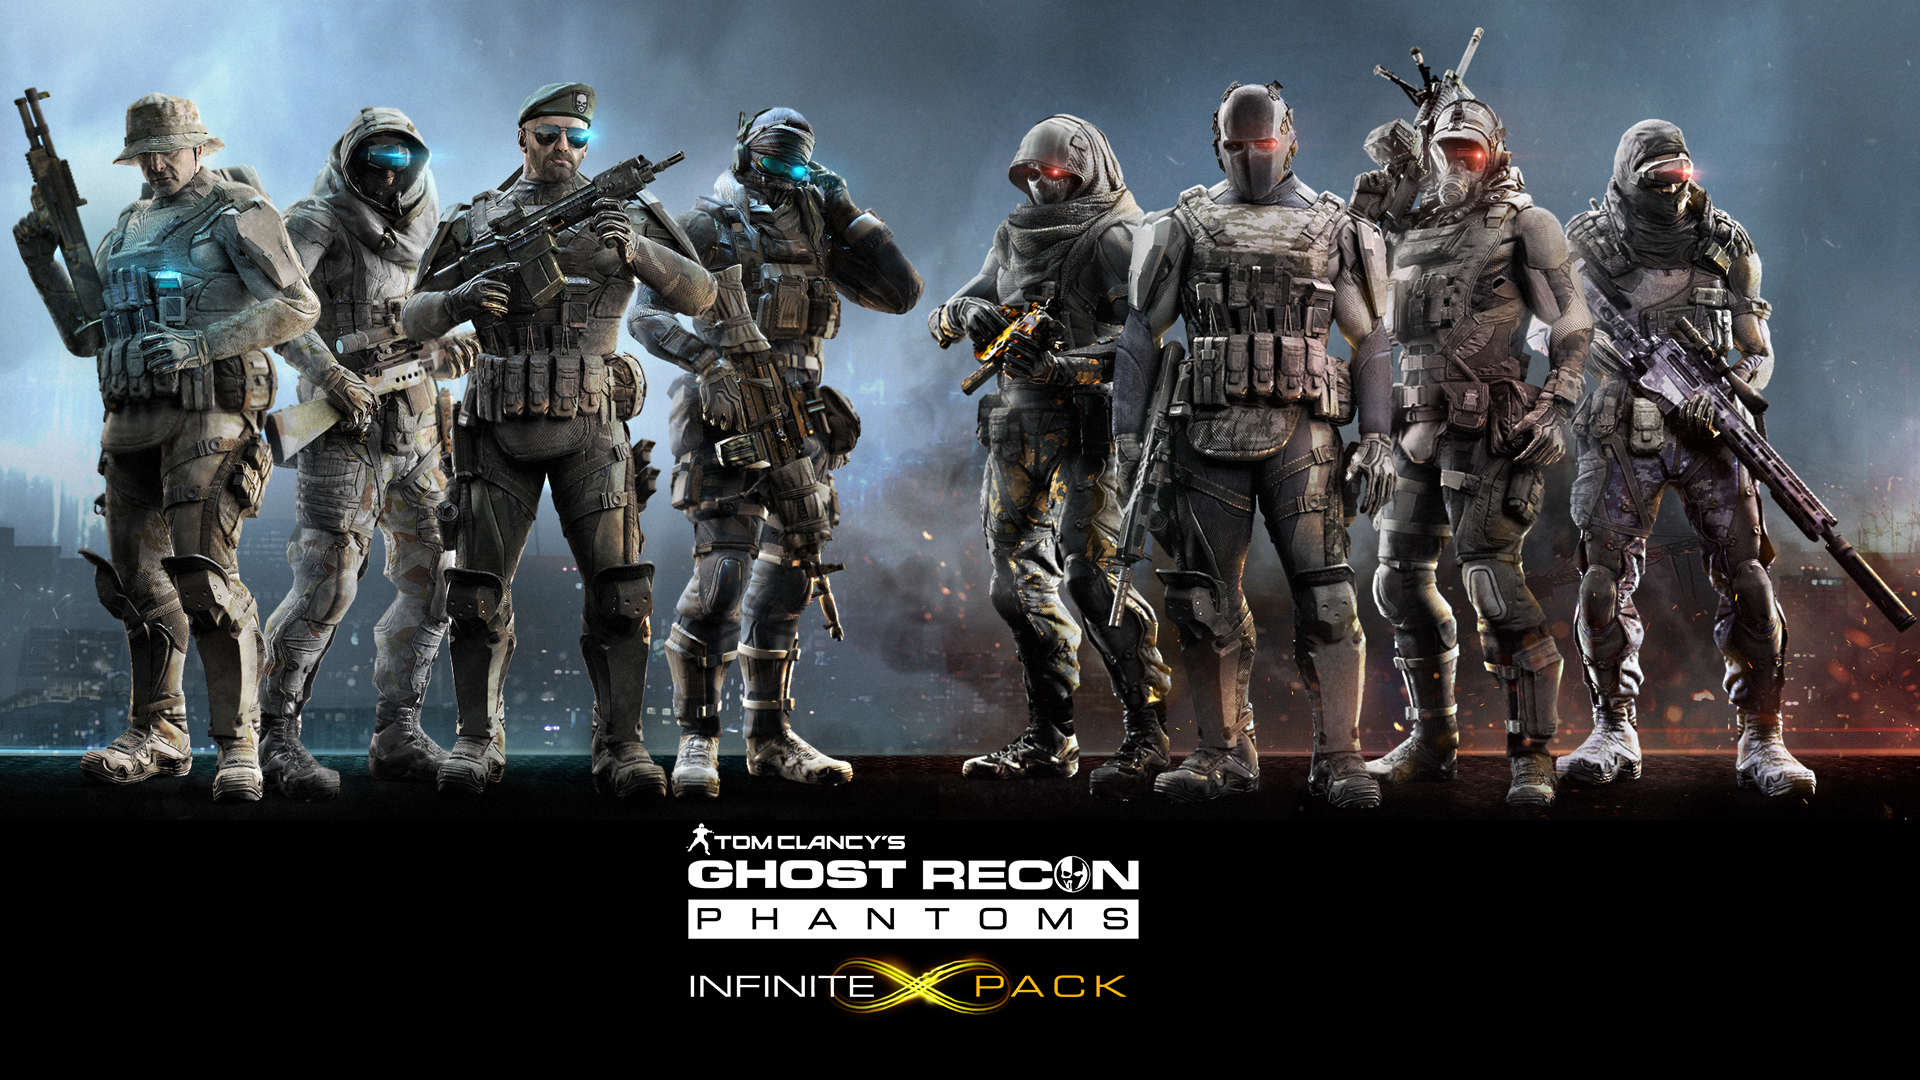 Tom Clancy's Ghost Recon Phantoms Windows Game